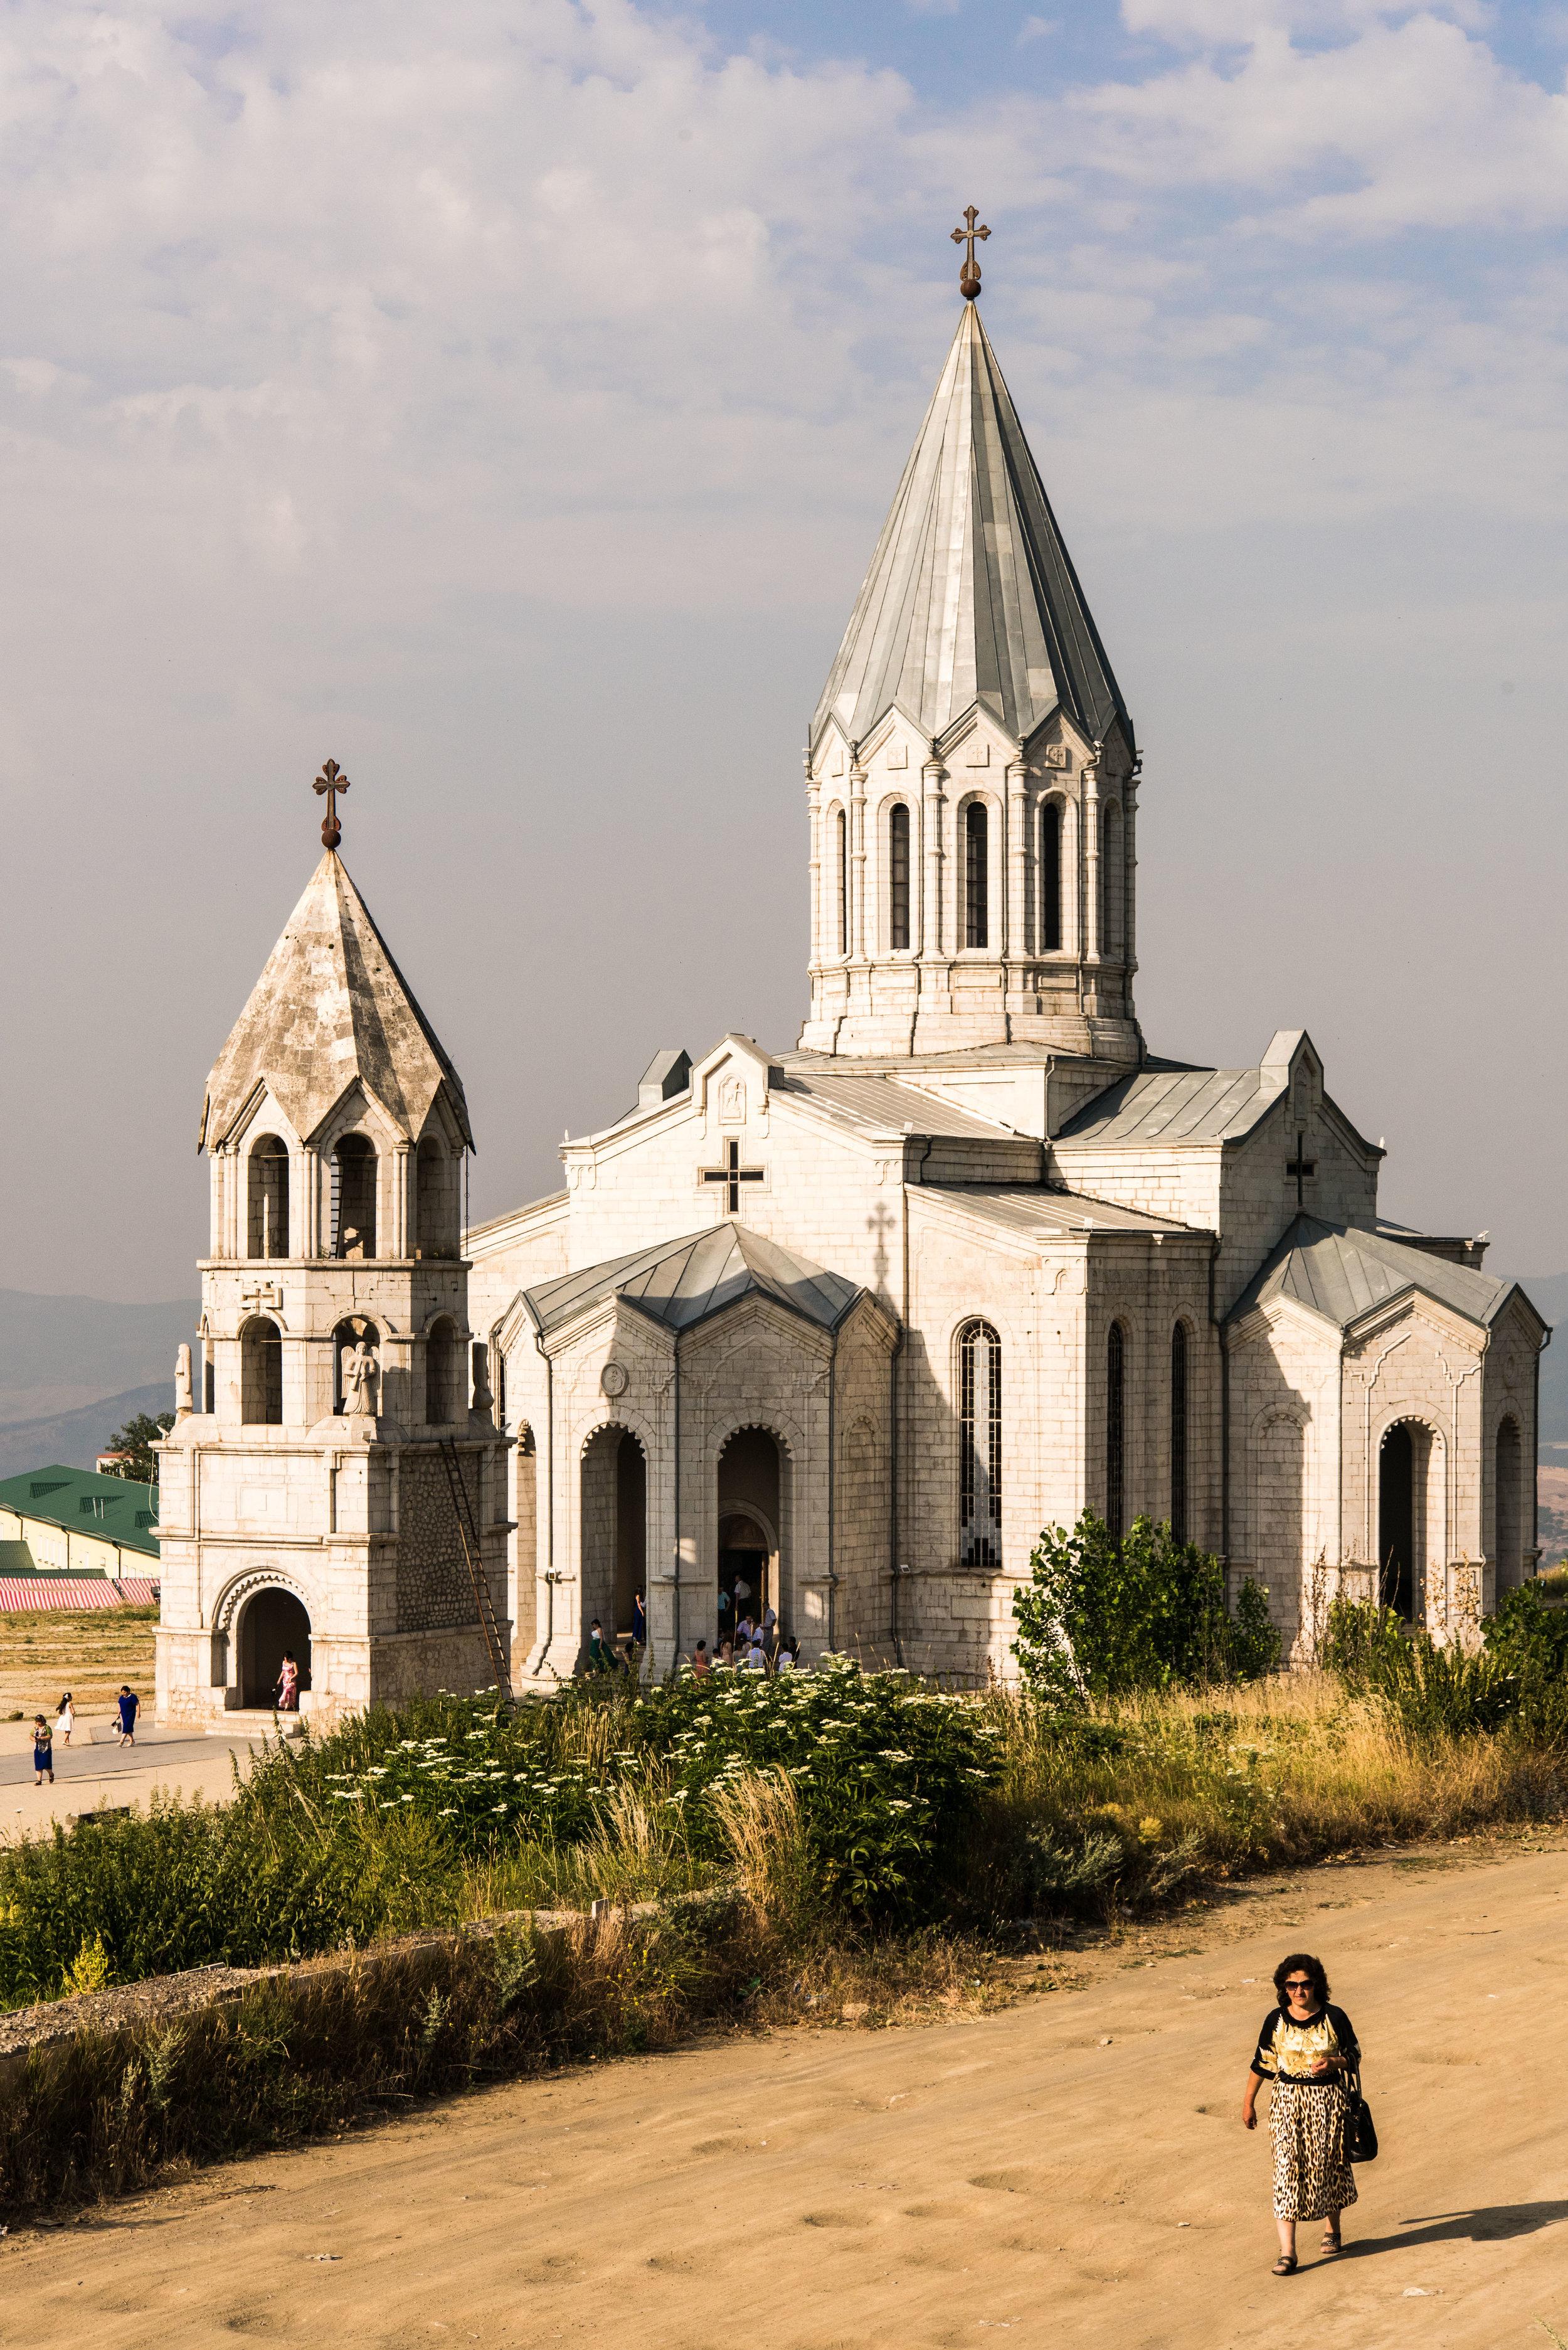 Gazenchetsots Church, now restored